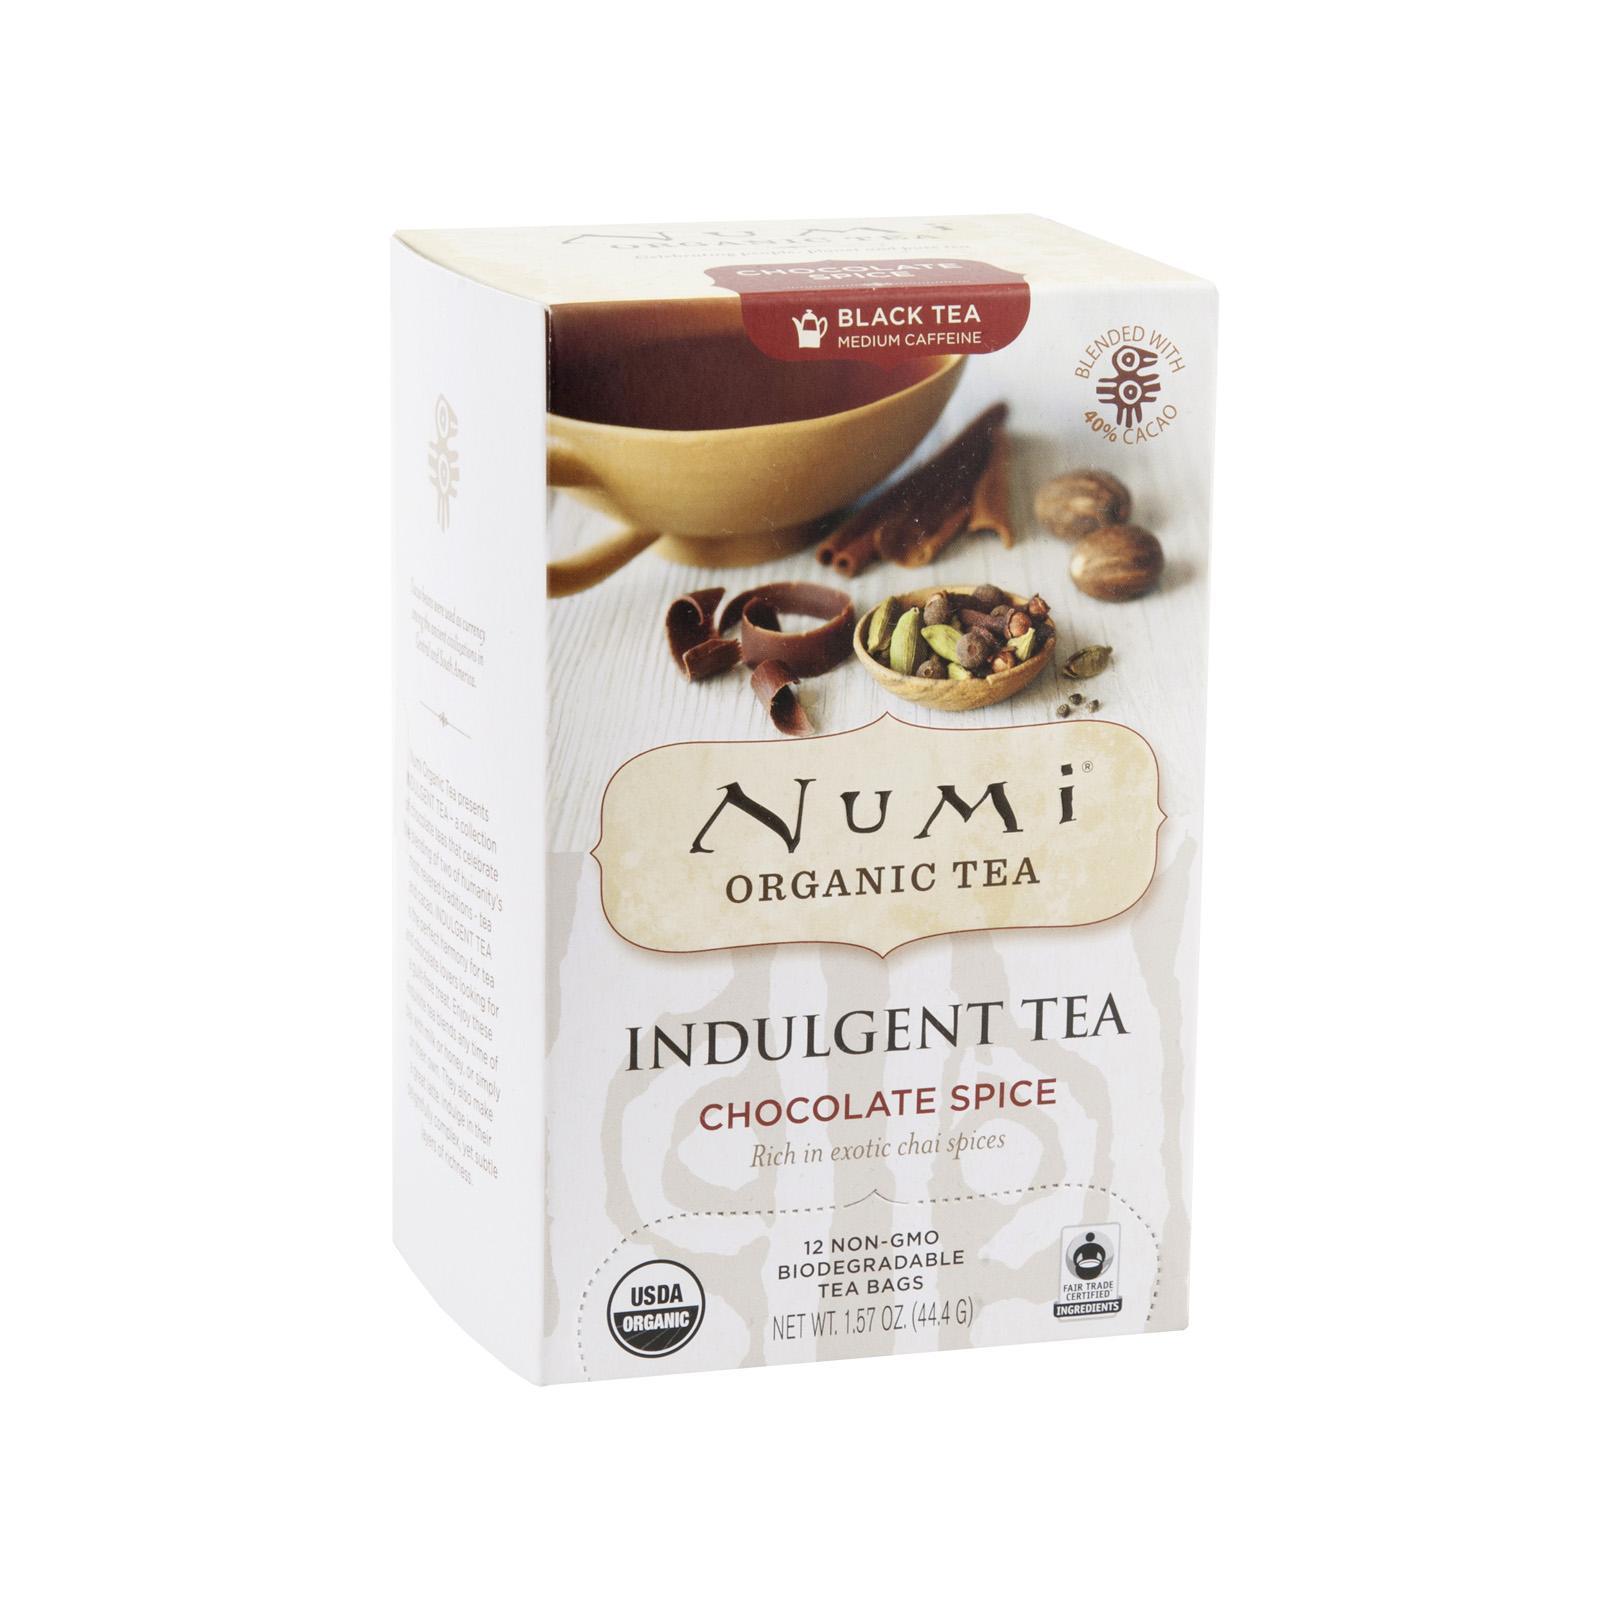 Numi Čokoládový čaj Spice, Indulgent Tea 12 ks, 44,4 g